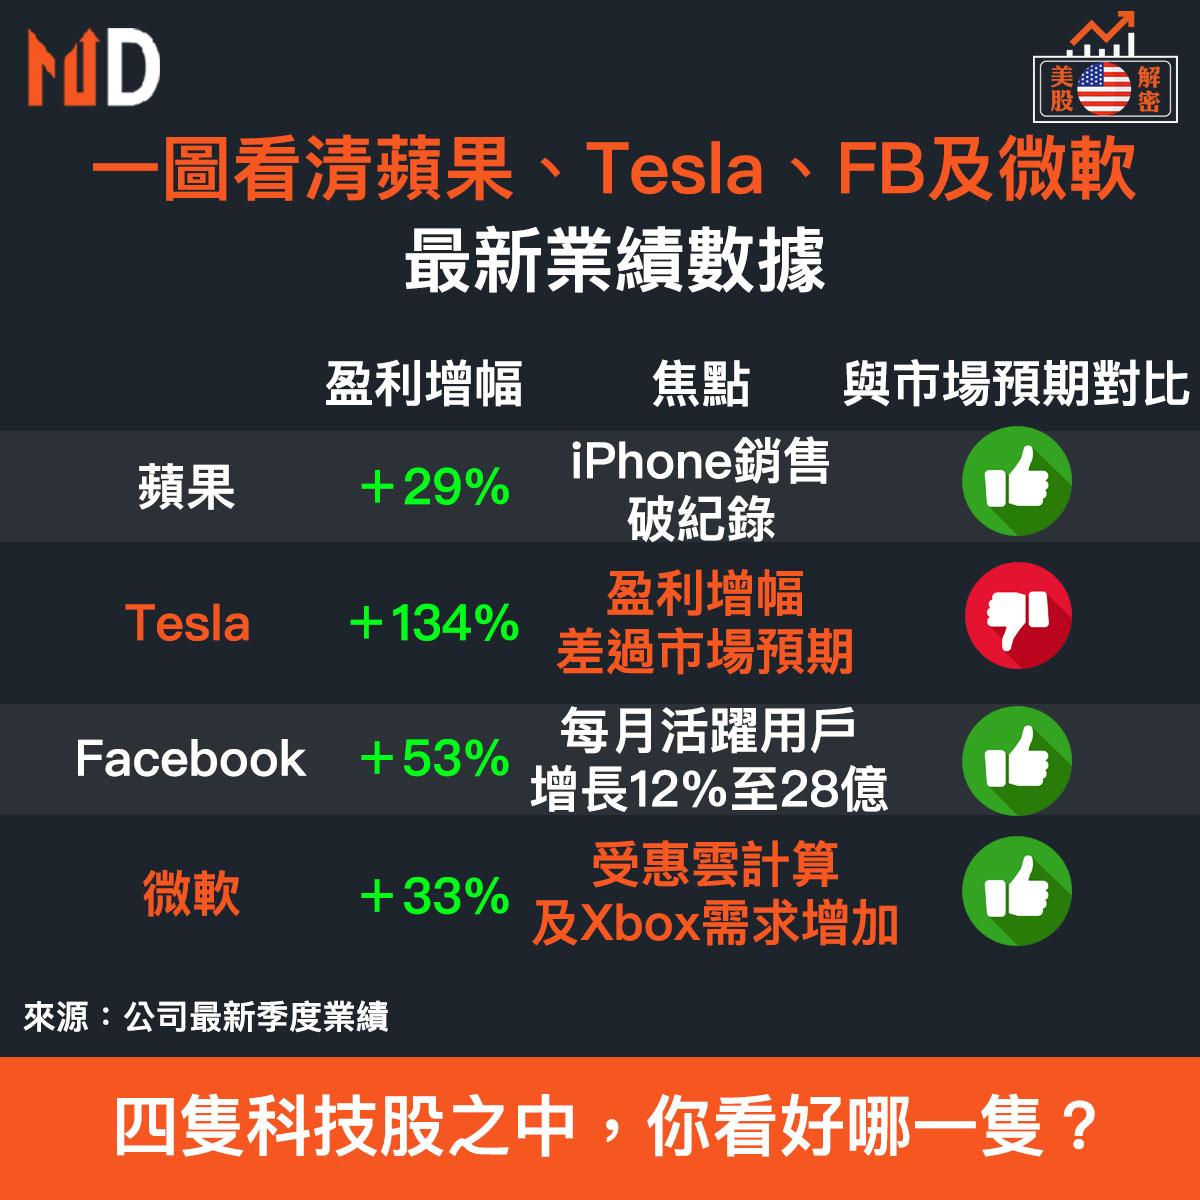 MD美股解密】一圖看清蘋果、Tesla、FB及微軟,最新業績數據